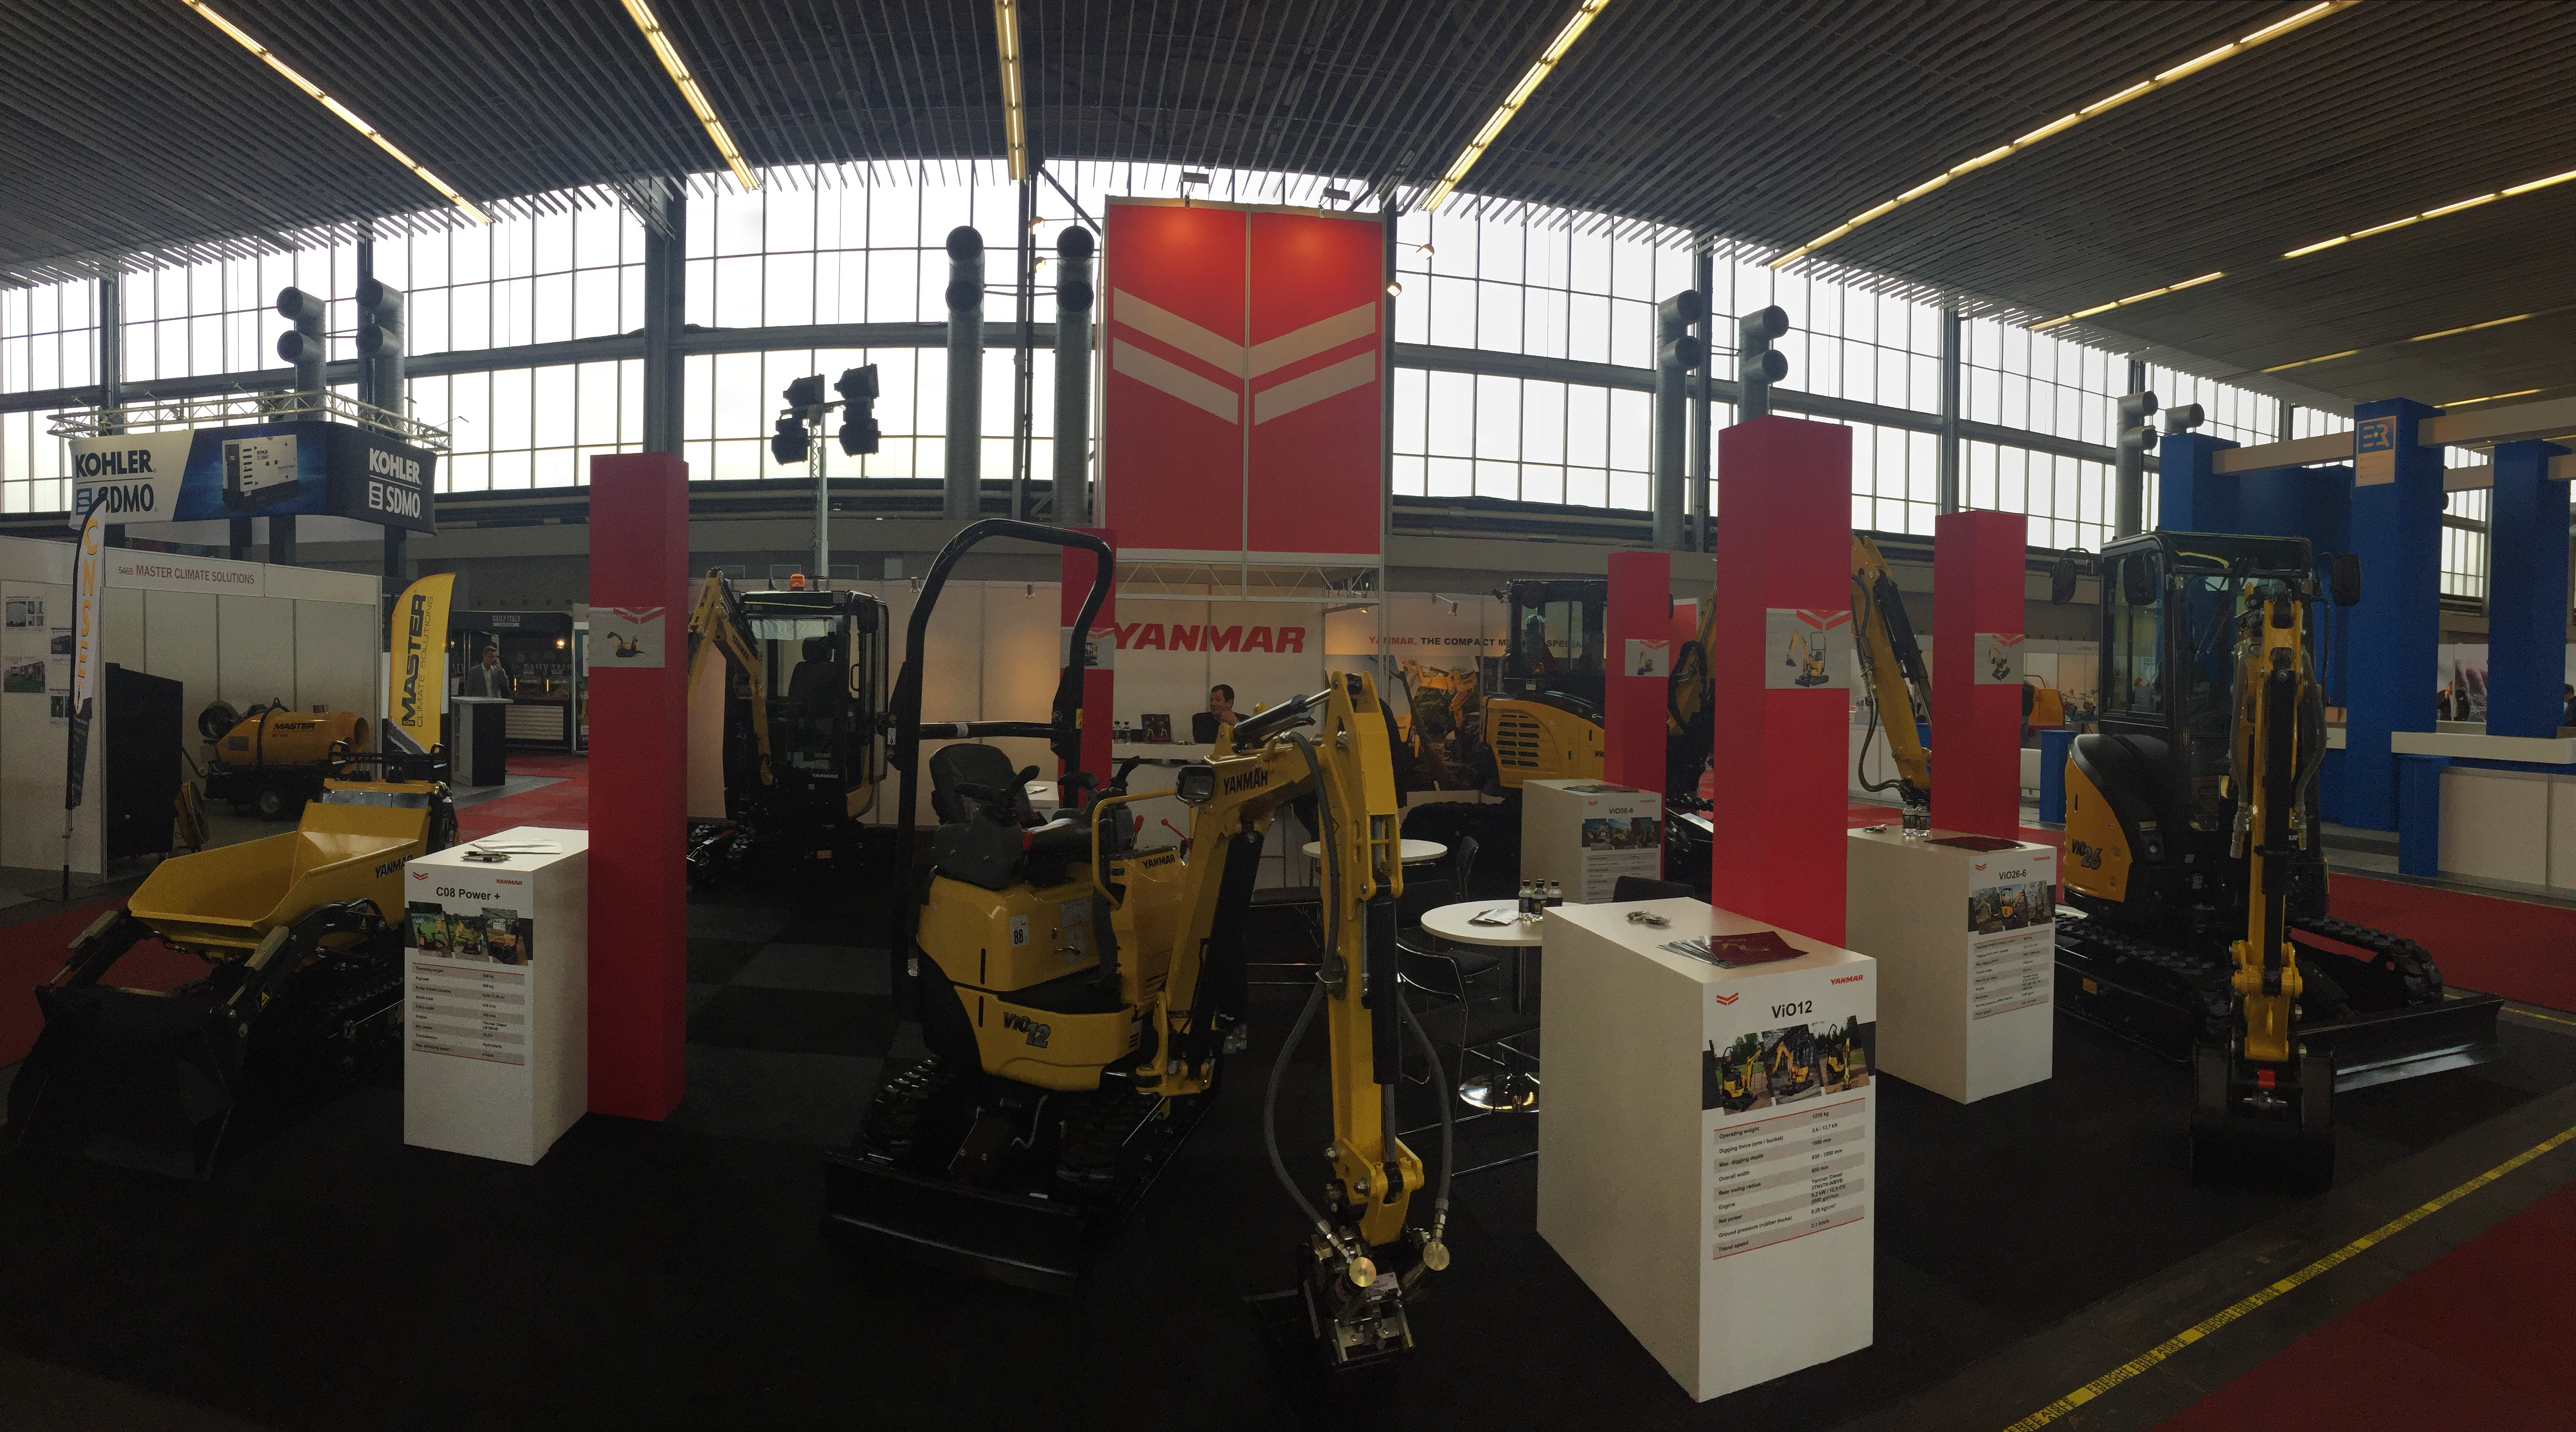 Yanmar all'IRE 2017 -  -Construction Notizie - MC5.0-Macchine Cantieri